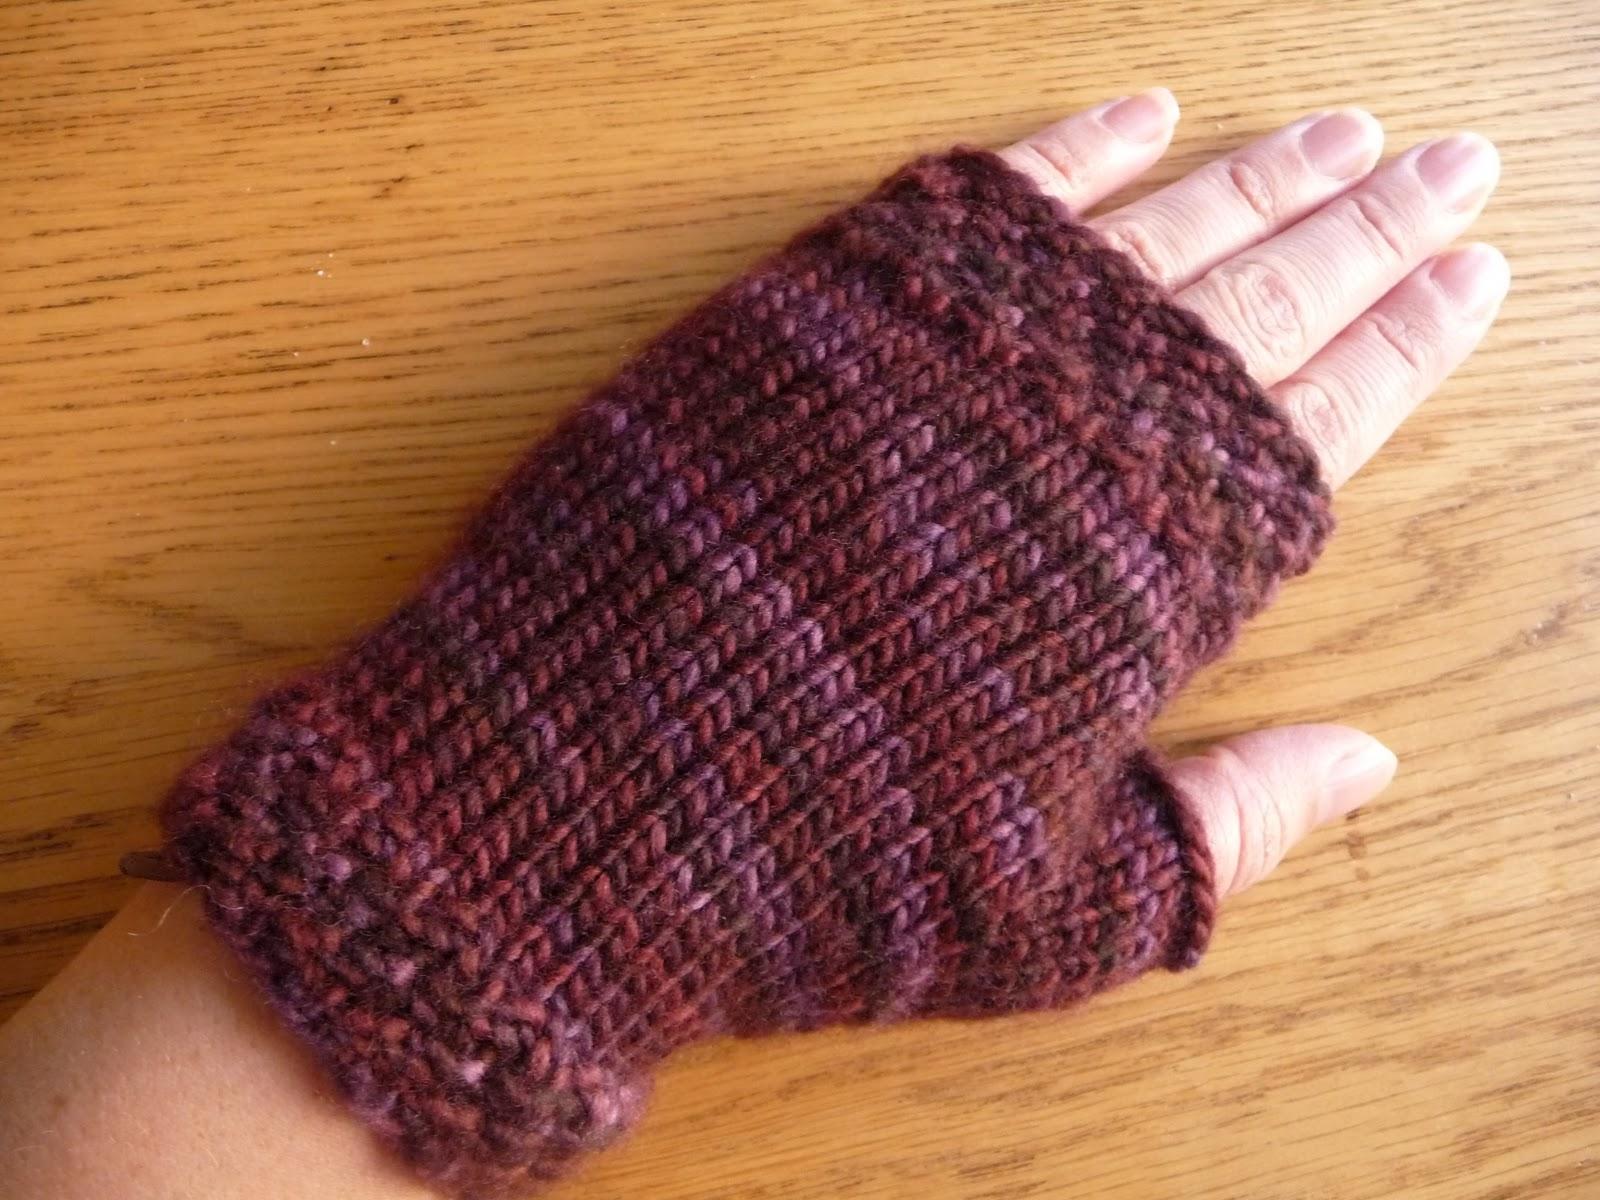 Knitting Patterns Mittens Fingerless - Catalog of Patterns